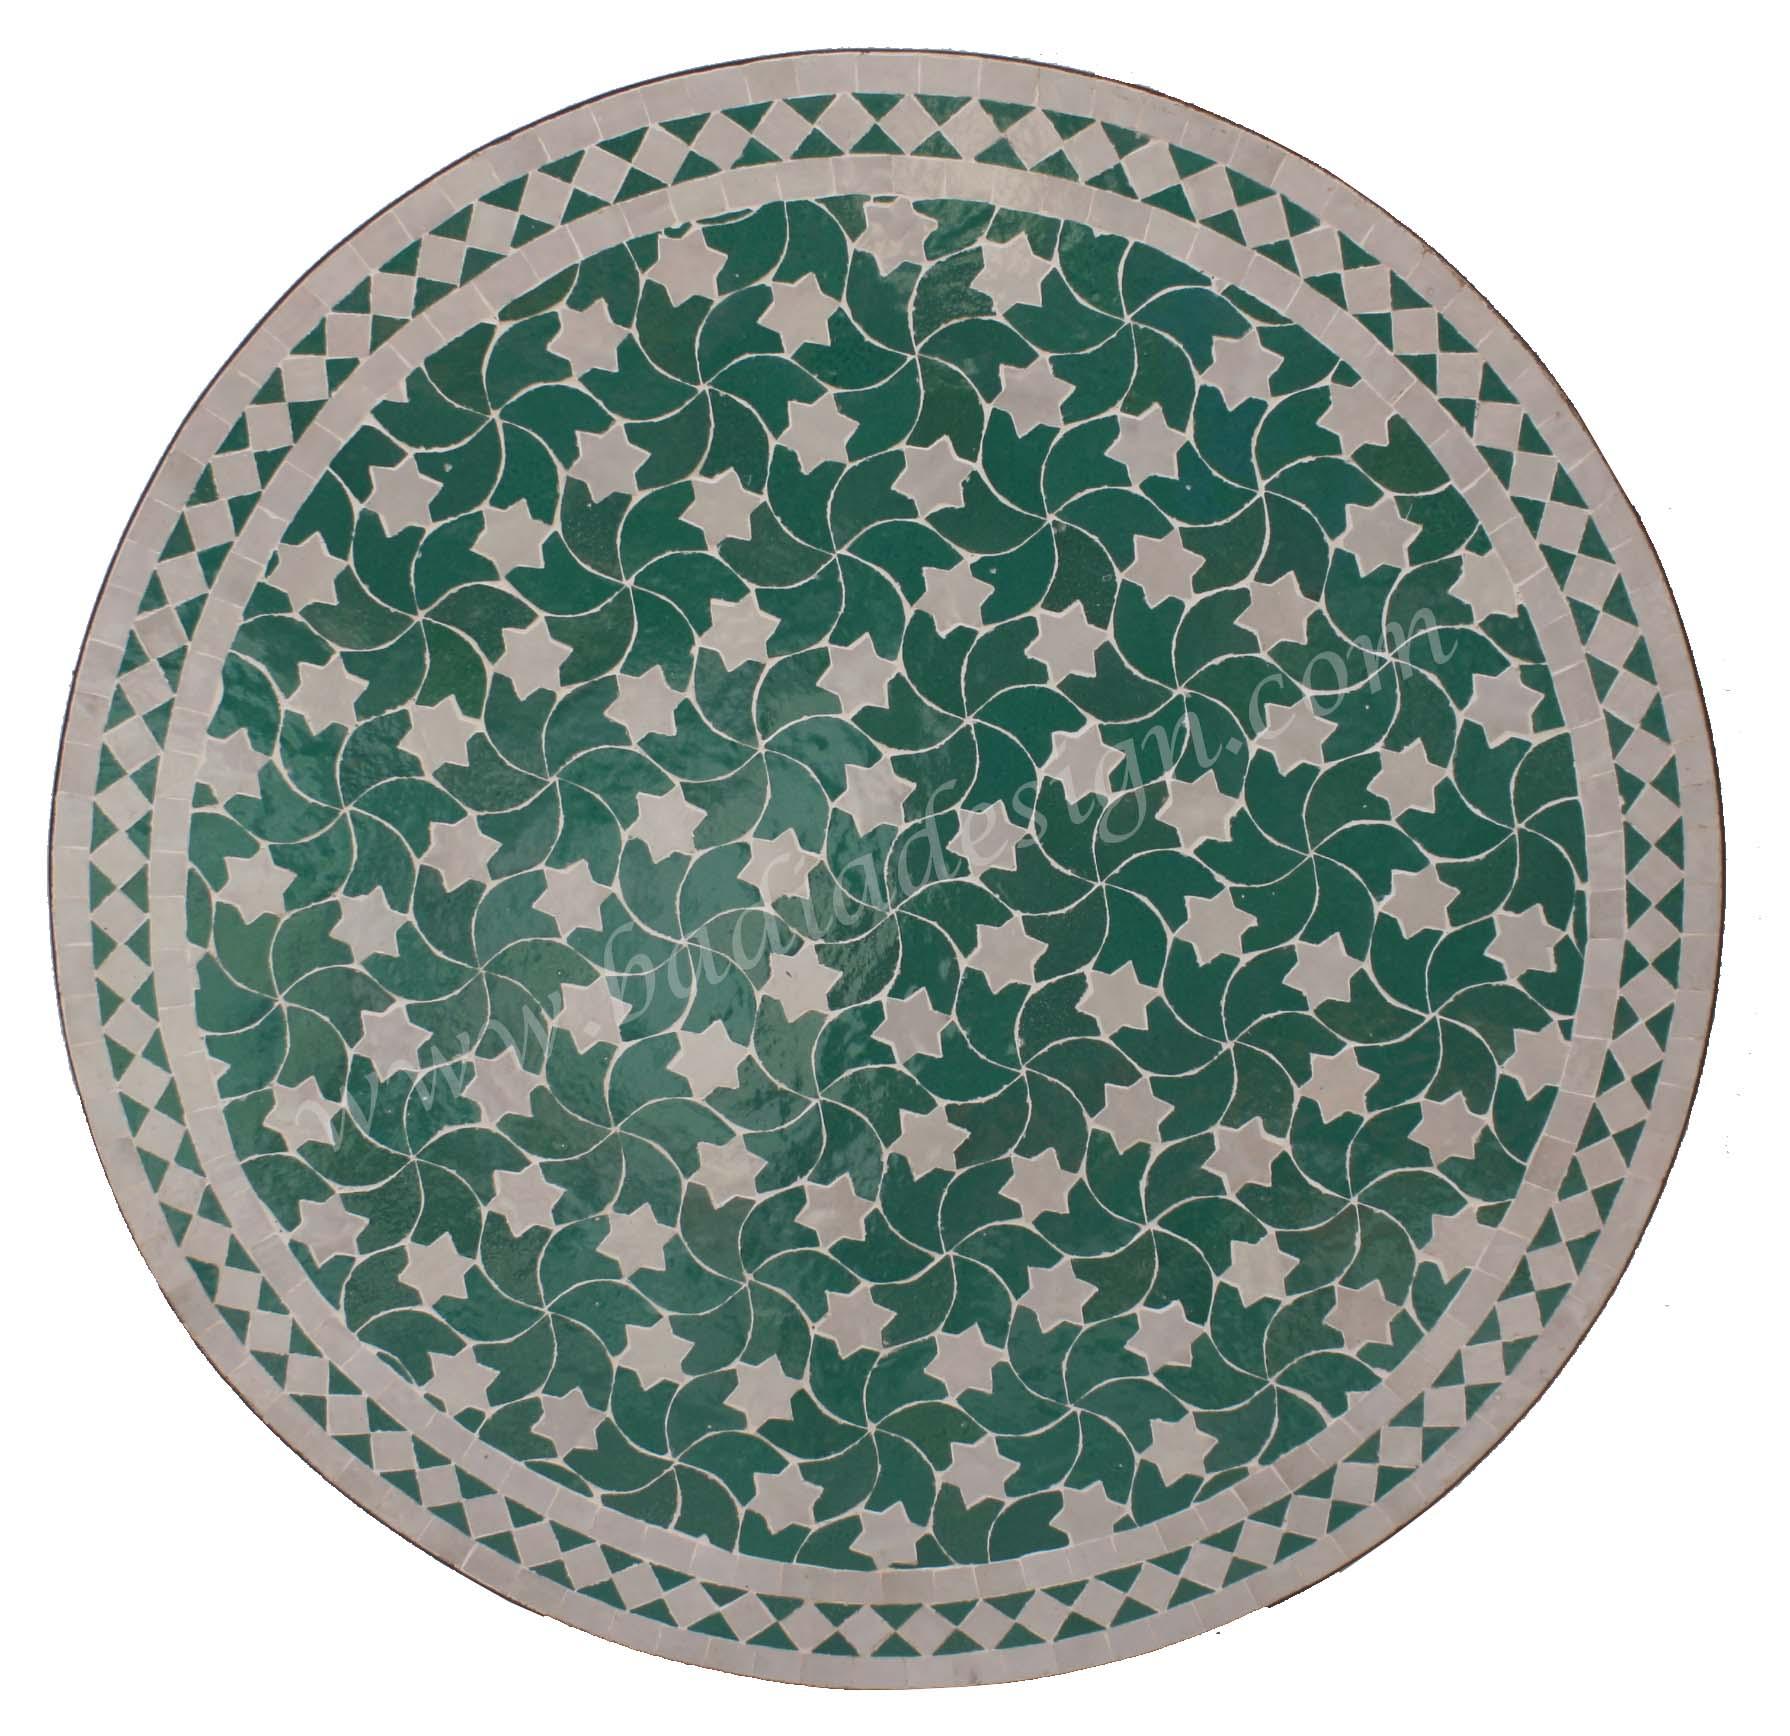 moroccan-mosaic-tile-table-mtr238-1.jpg